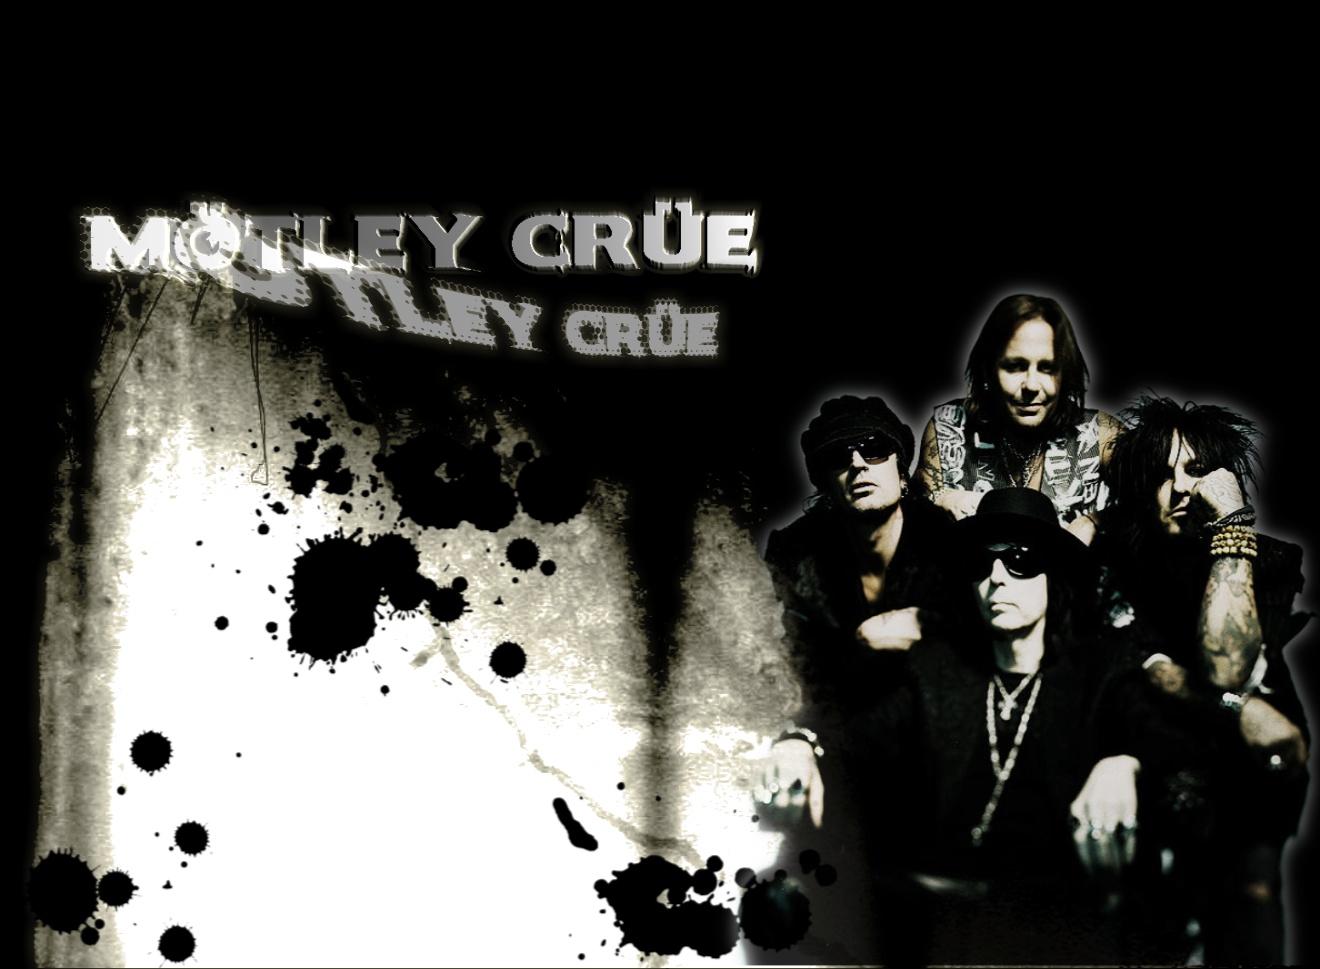 http://1.bp.blogspot.com/_gVPRTgtlUSQ/S7gumeZBlRI/AAAAAAAAAnM/06kMRCBQCiM/s1600/Motley+Crue+wallpape.jpg